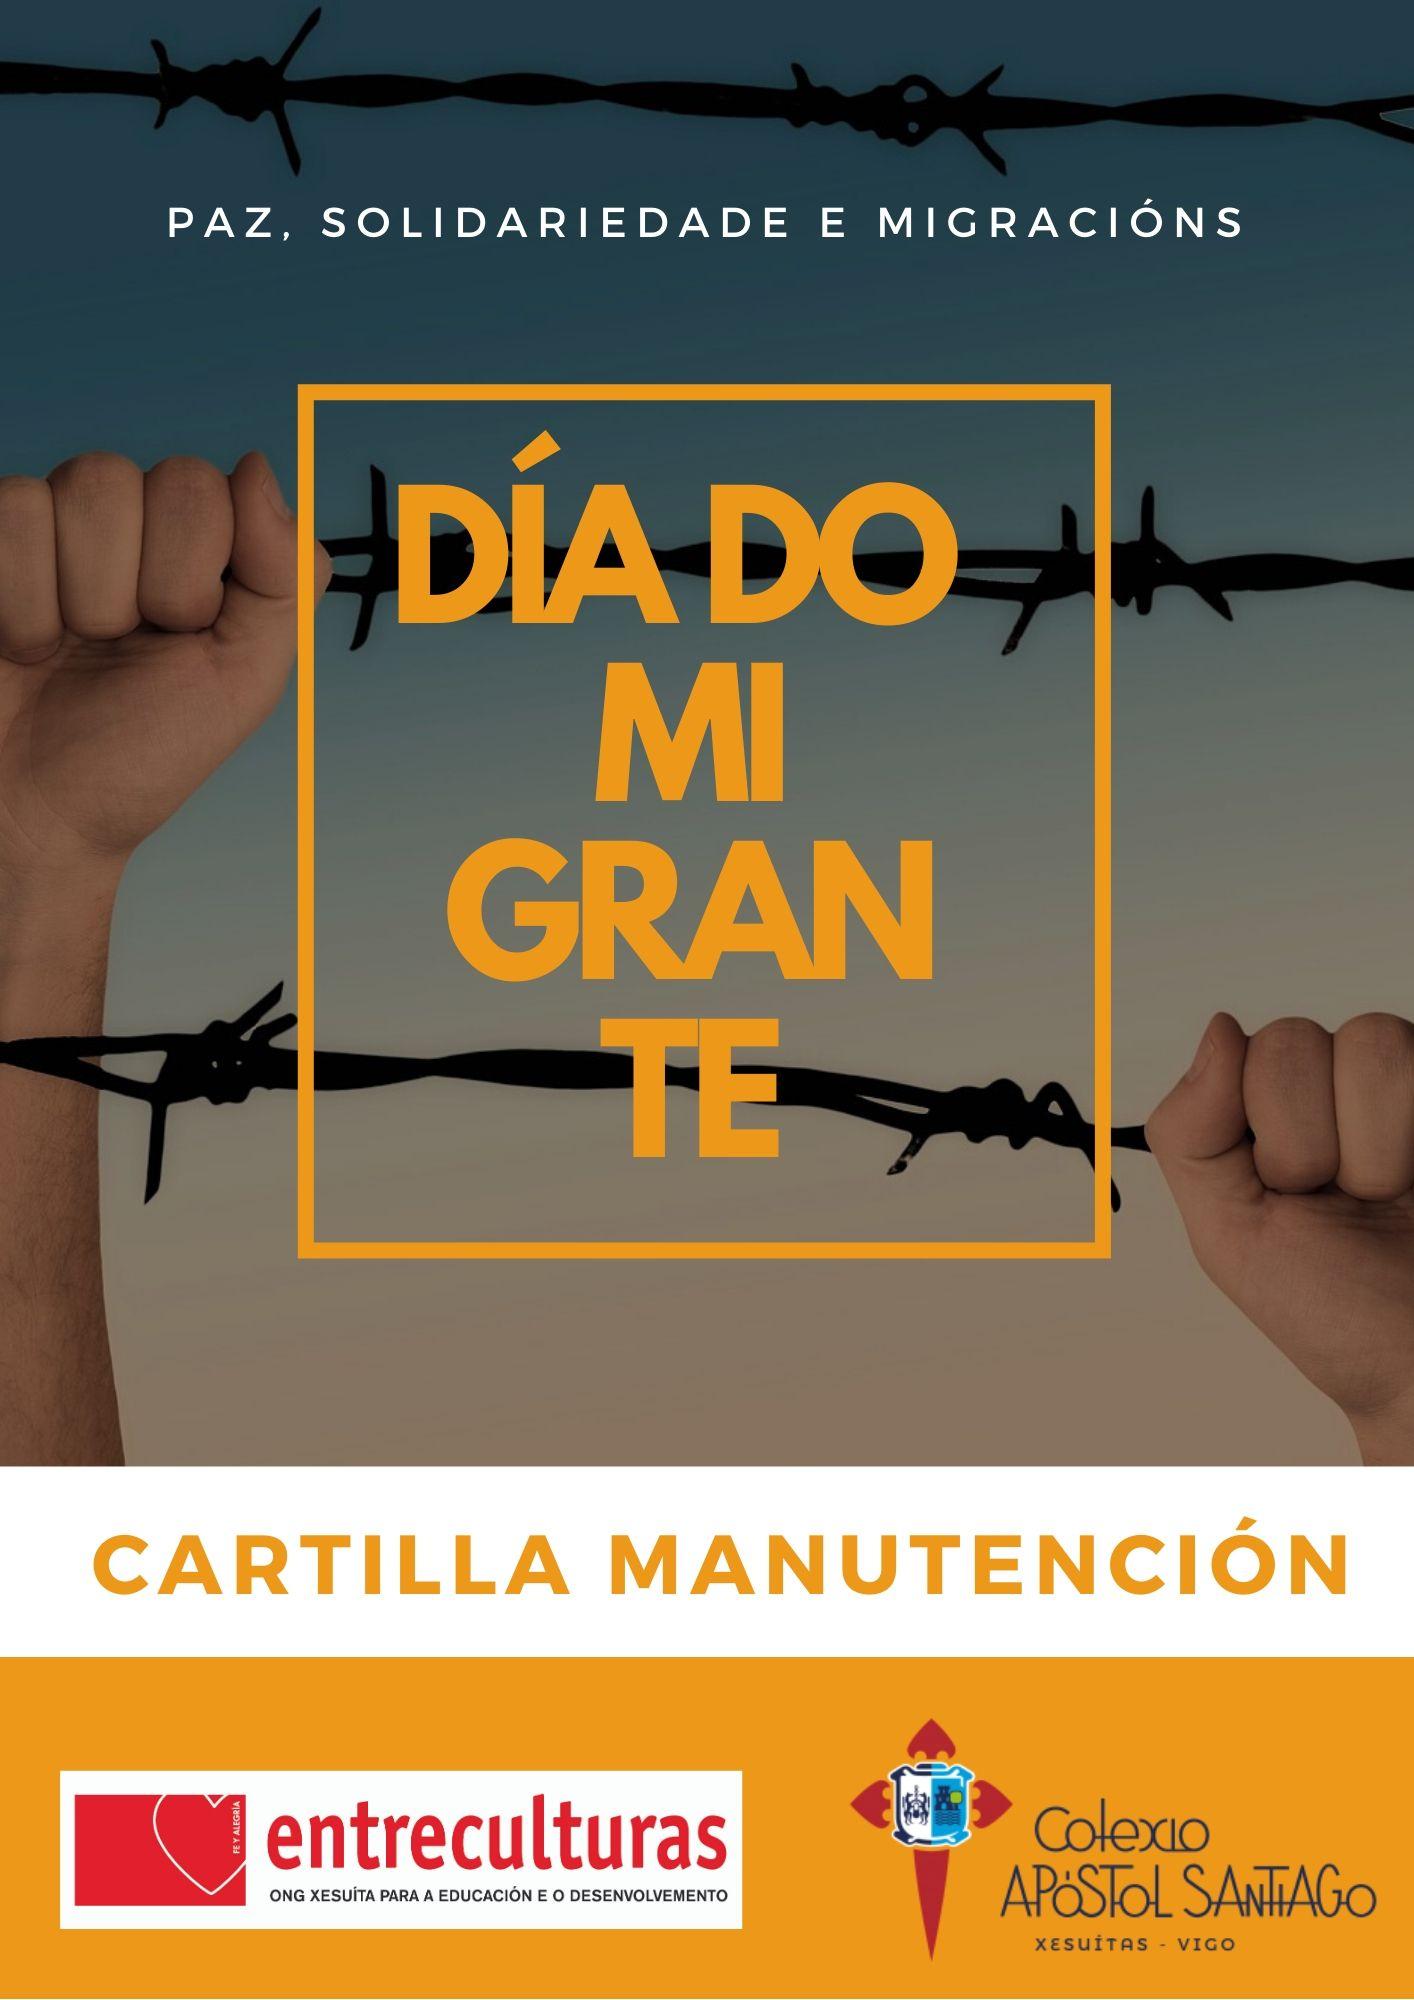 O Día de Migrante, aprazado para o 4 de febreiro